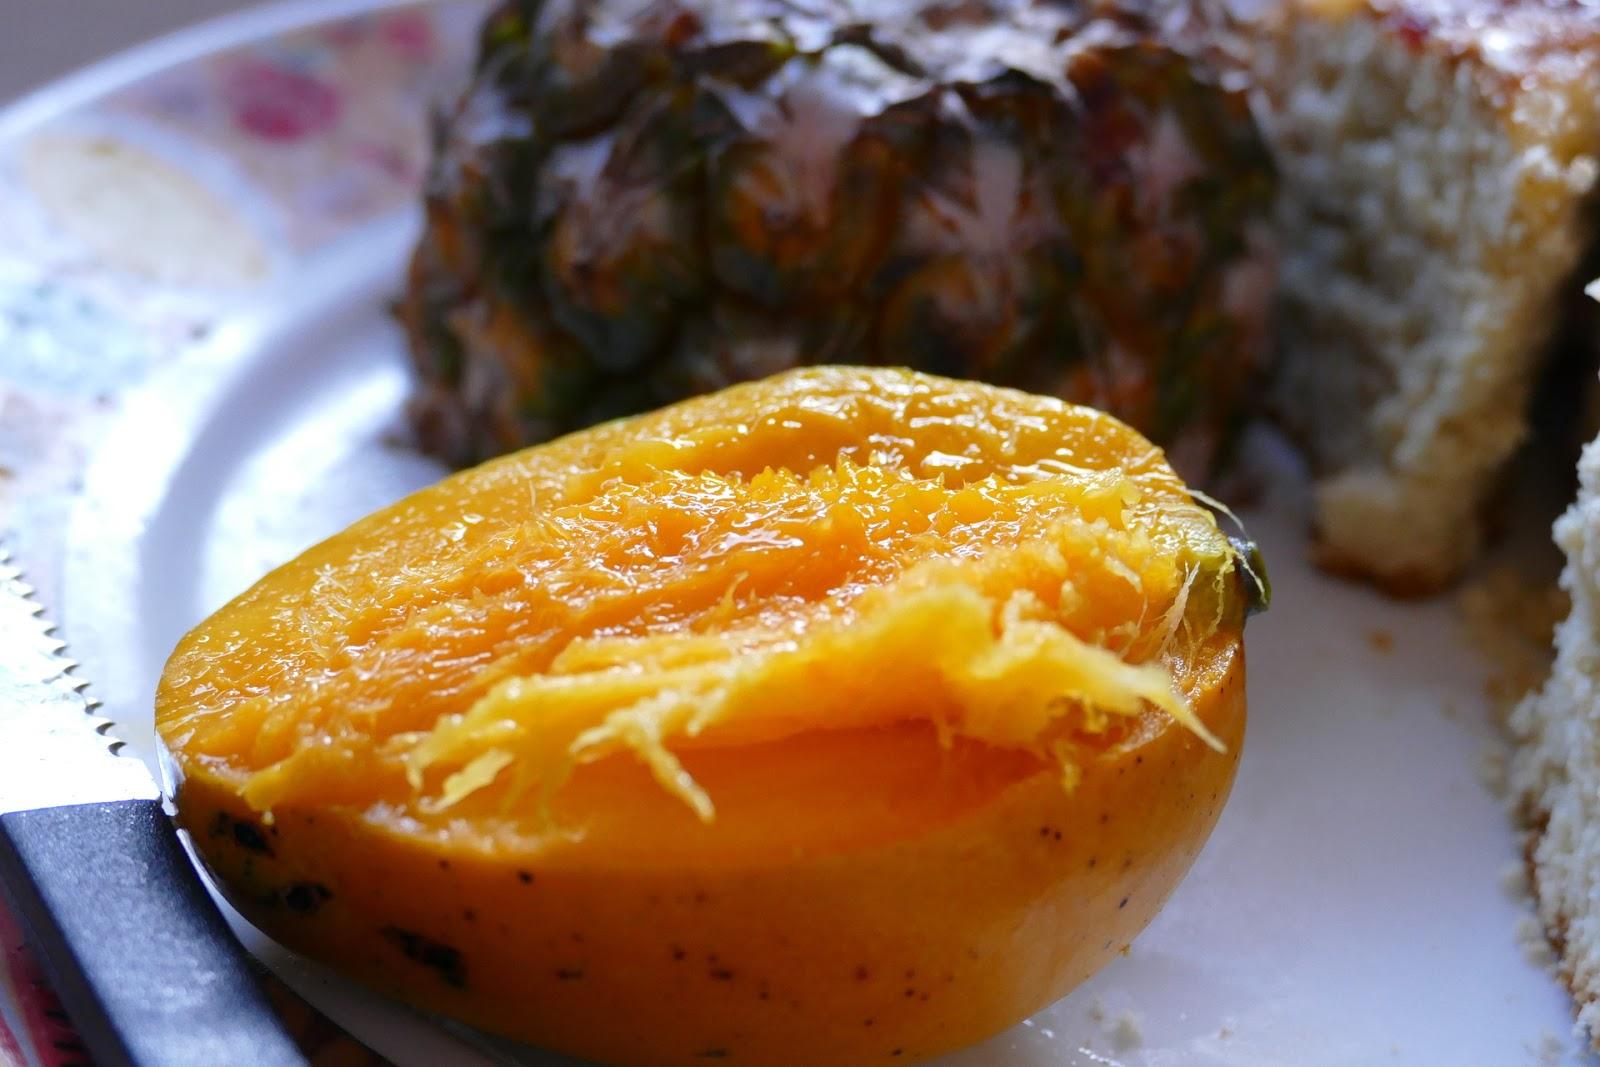 Peeled Mango fresh on plate